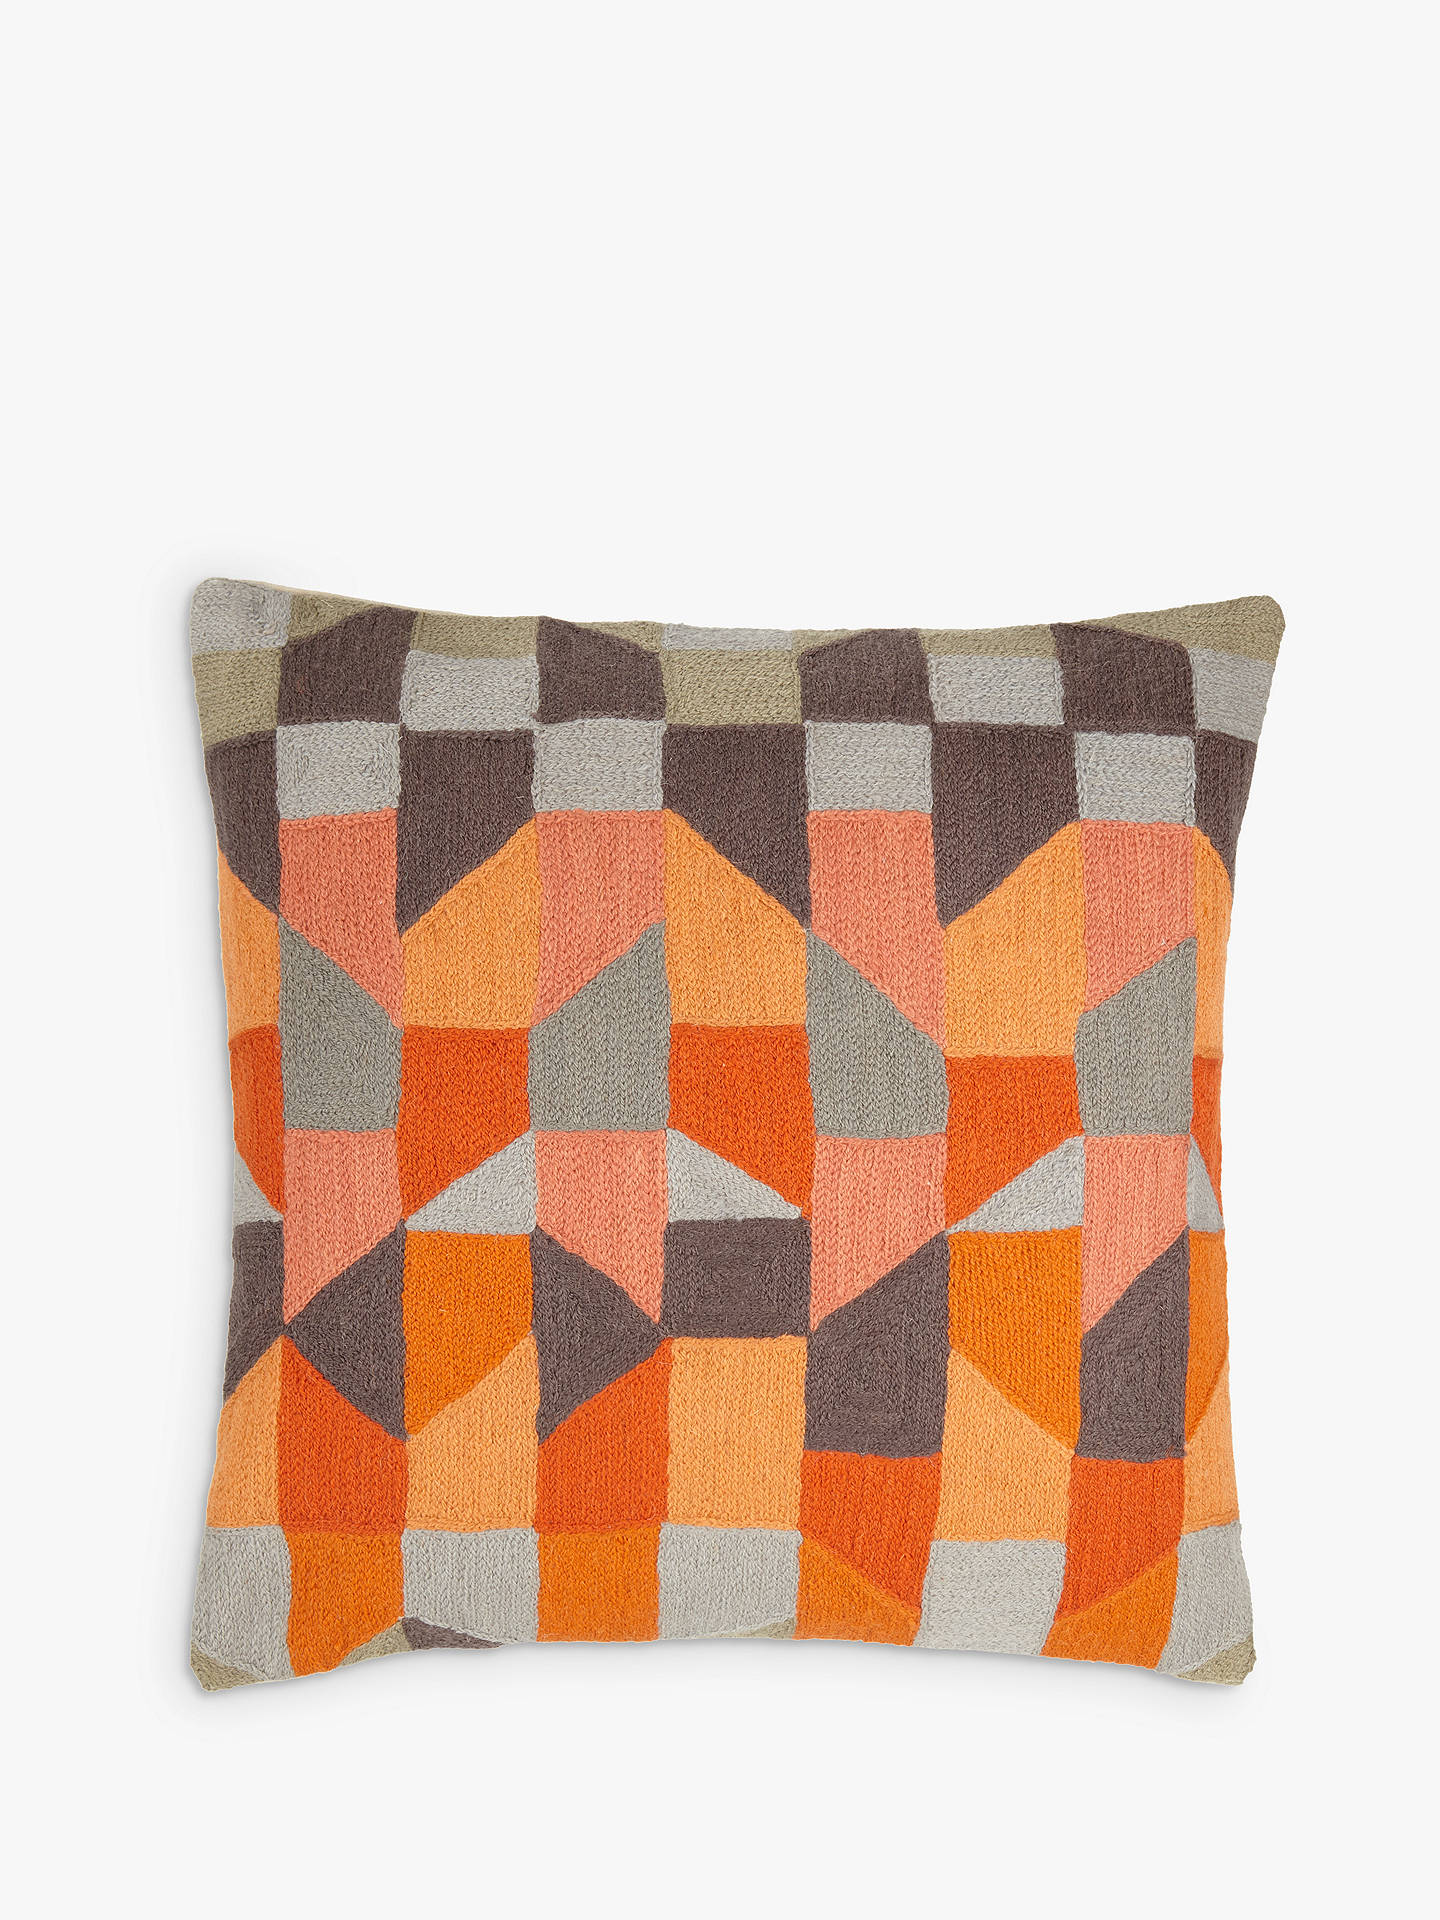 john lewis partners stack cushion orange grey at john. Black Bedroom Furniture Sets. Home Design Ideas